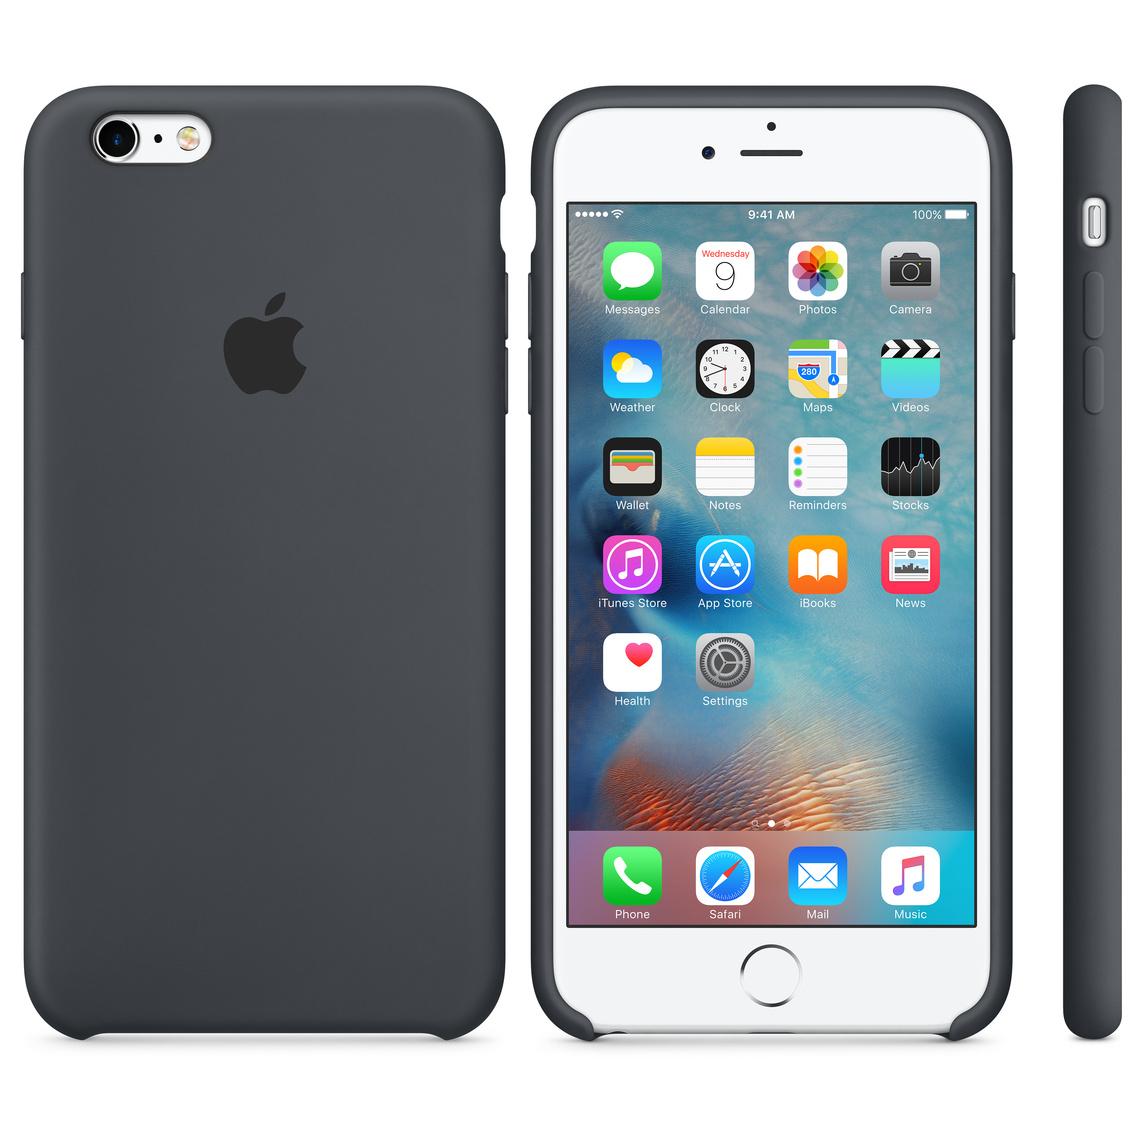 innovative design 3a59f 9e484 iPhone 6 Plus / 6s Plus Silicone Case - Charcoal Grey